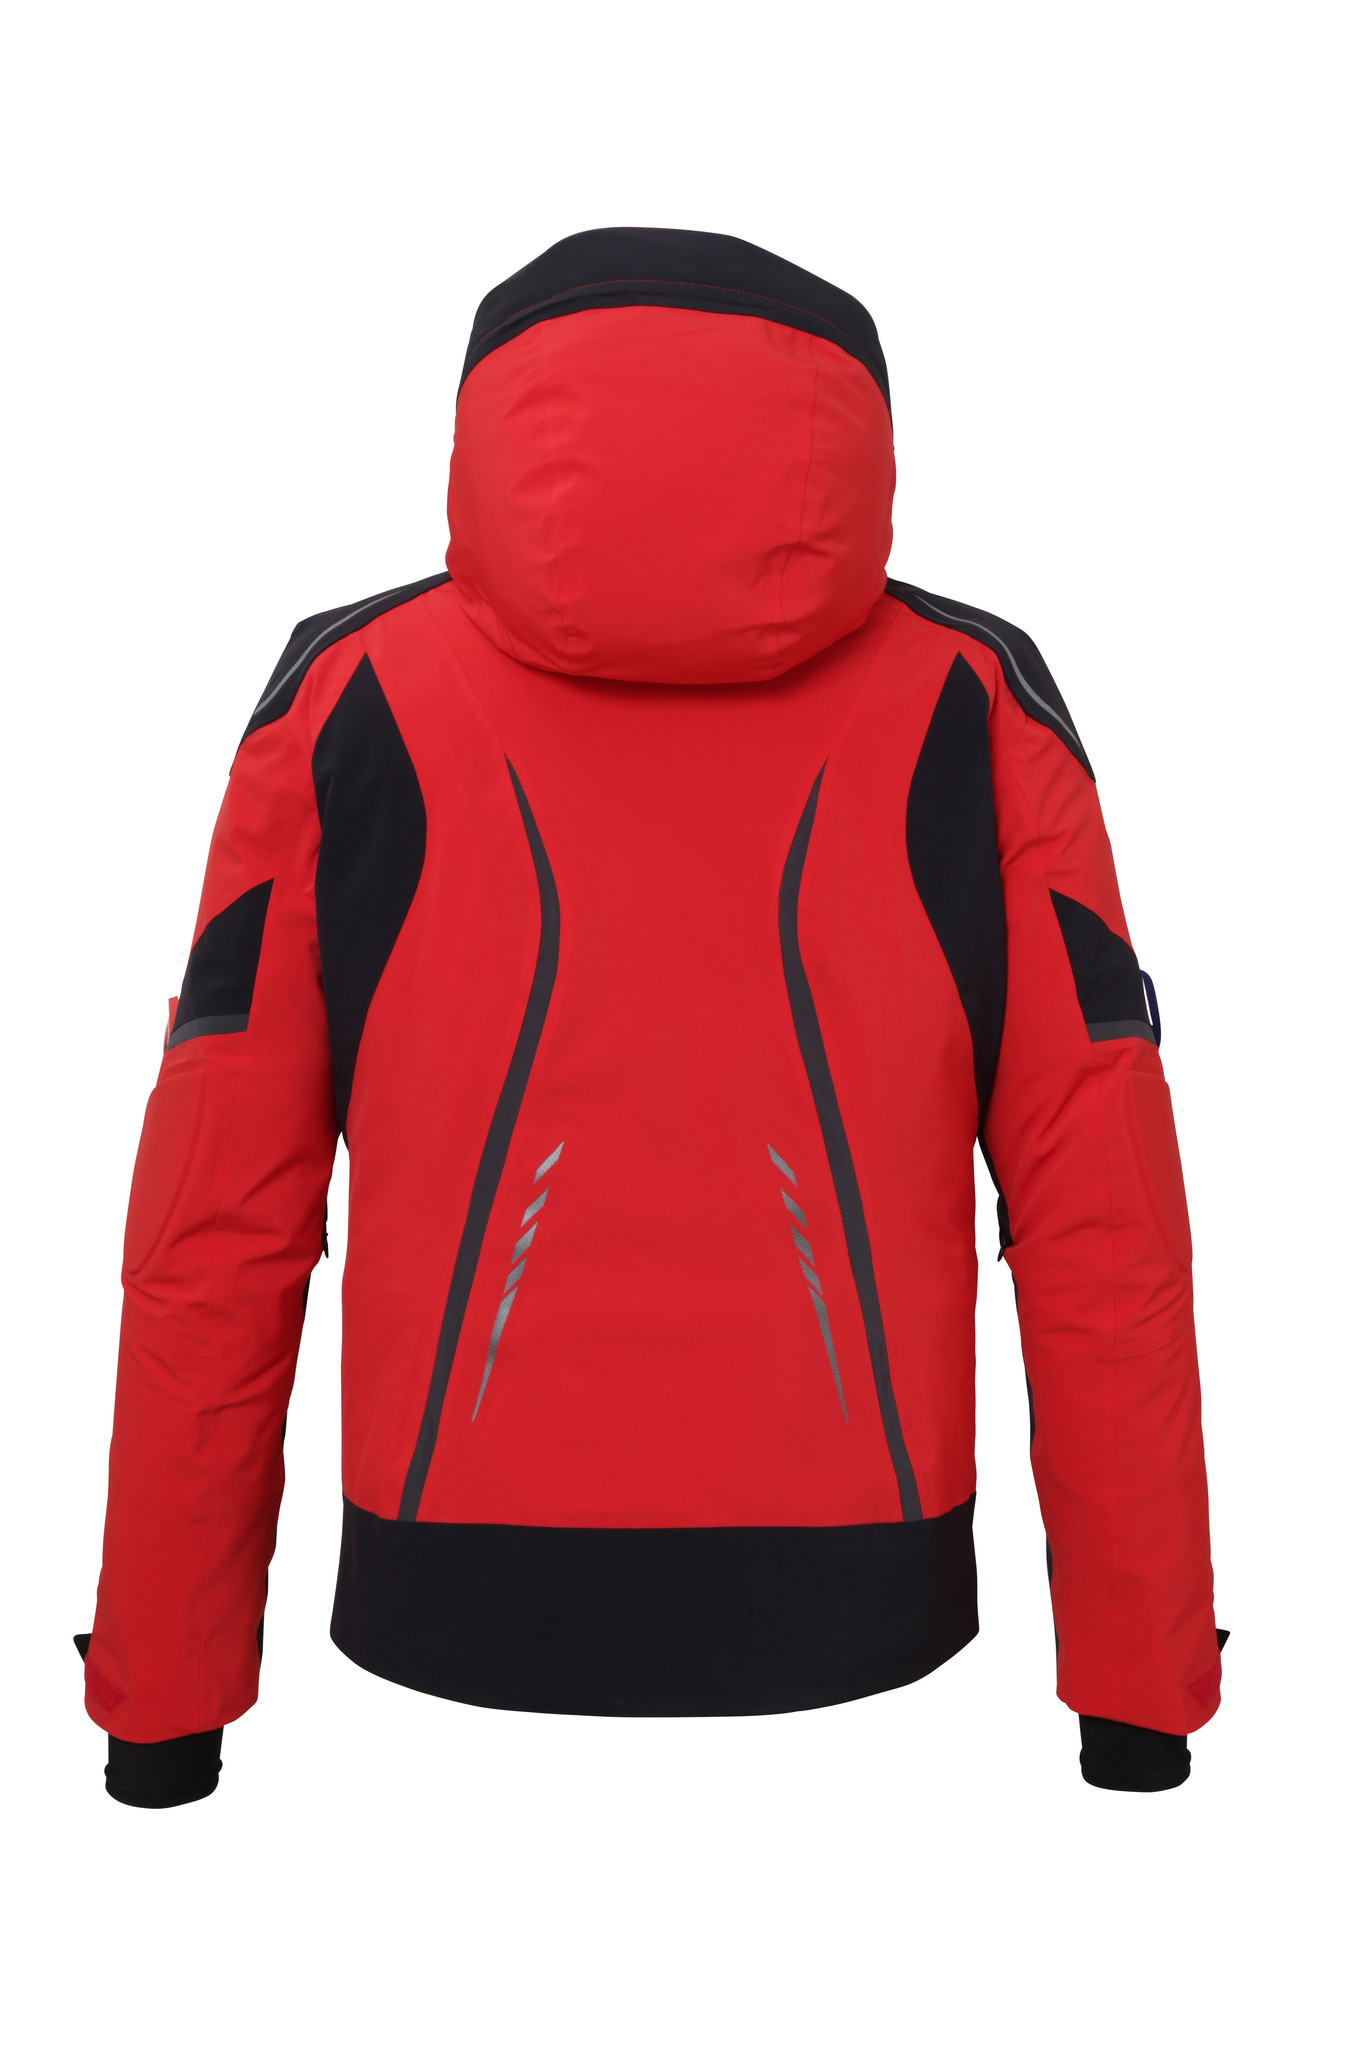 PHENIX Monza Jacket